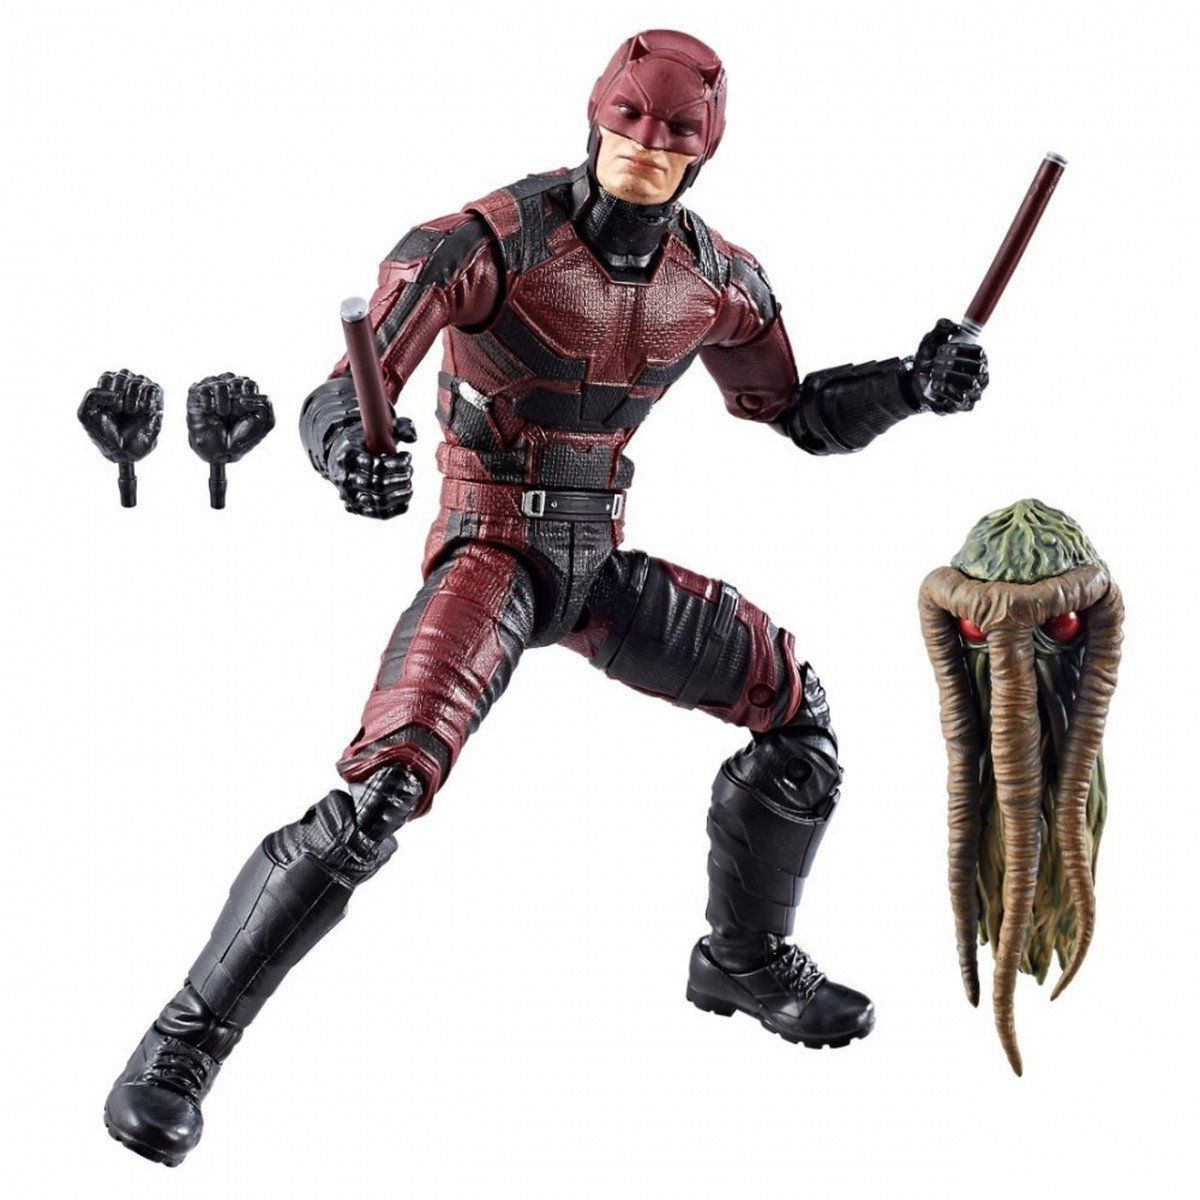 Boneco Demolidor (Daredevil): Marvel Legends - Hasbro